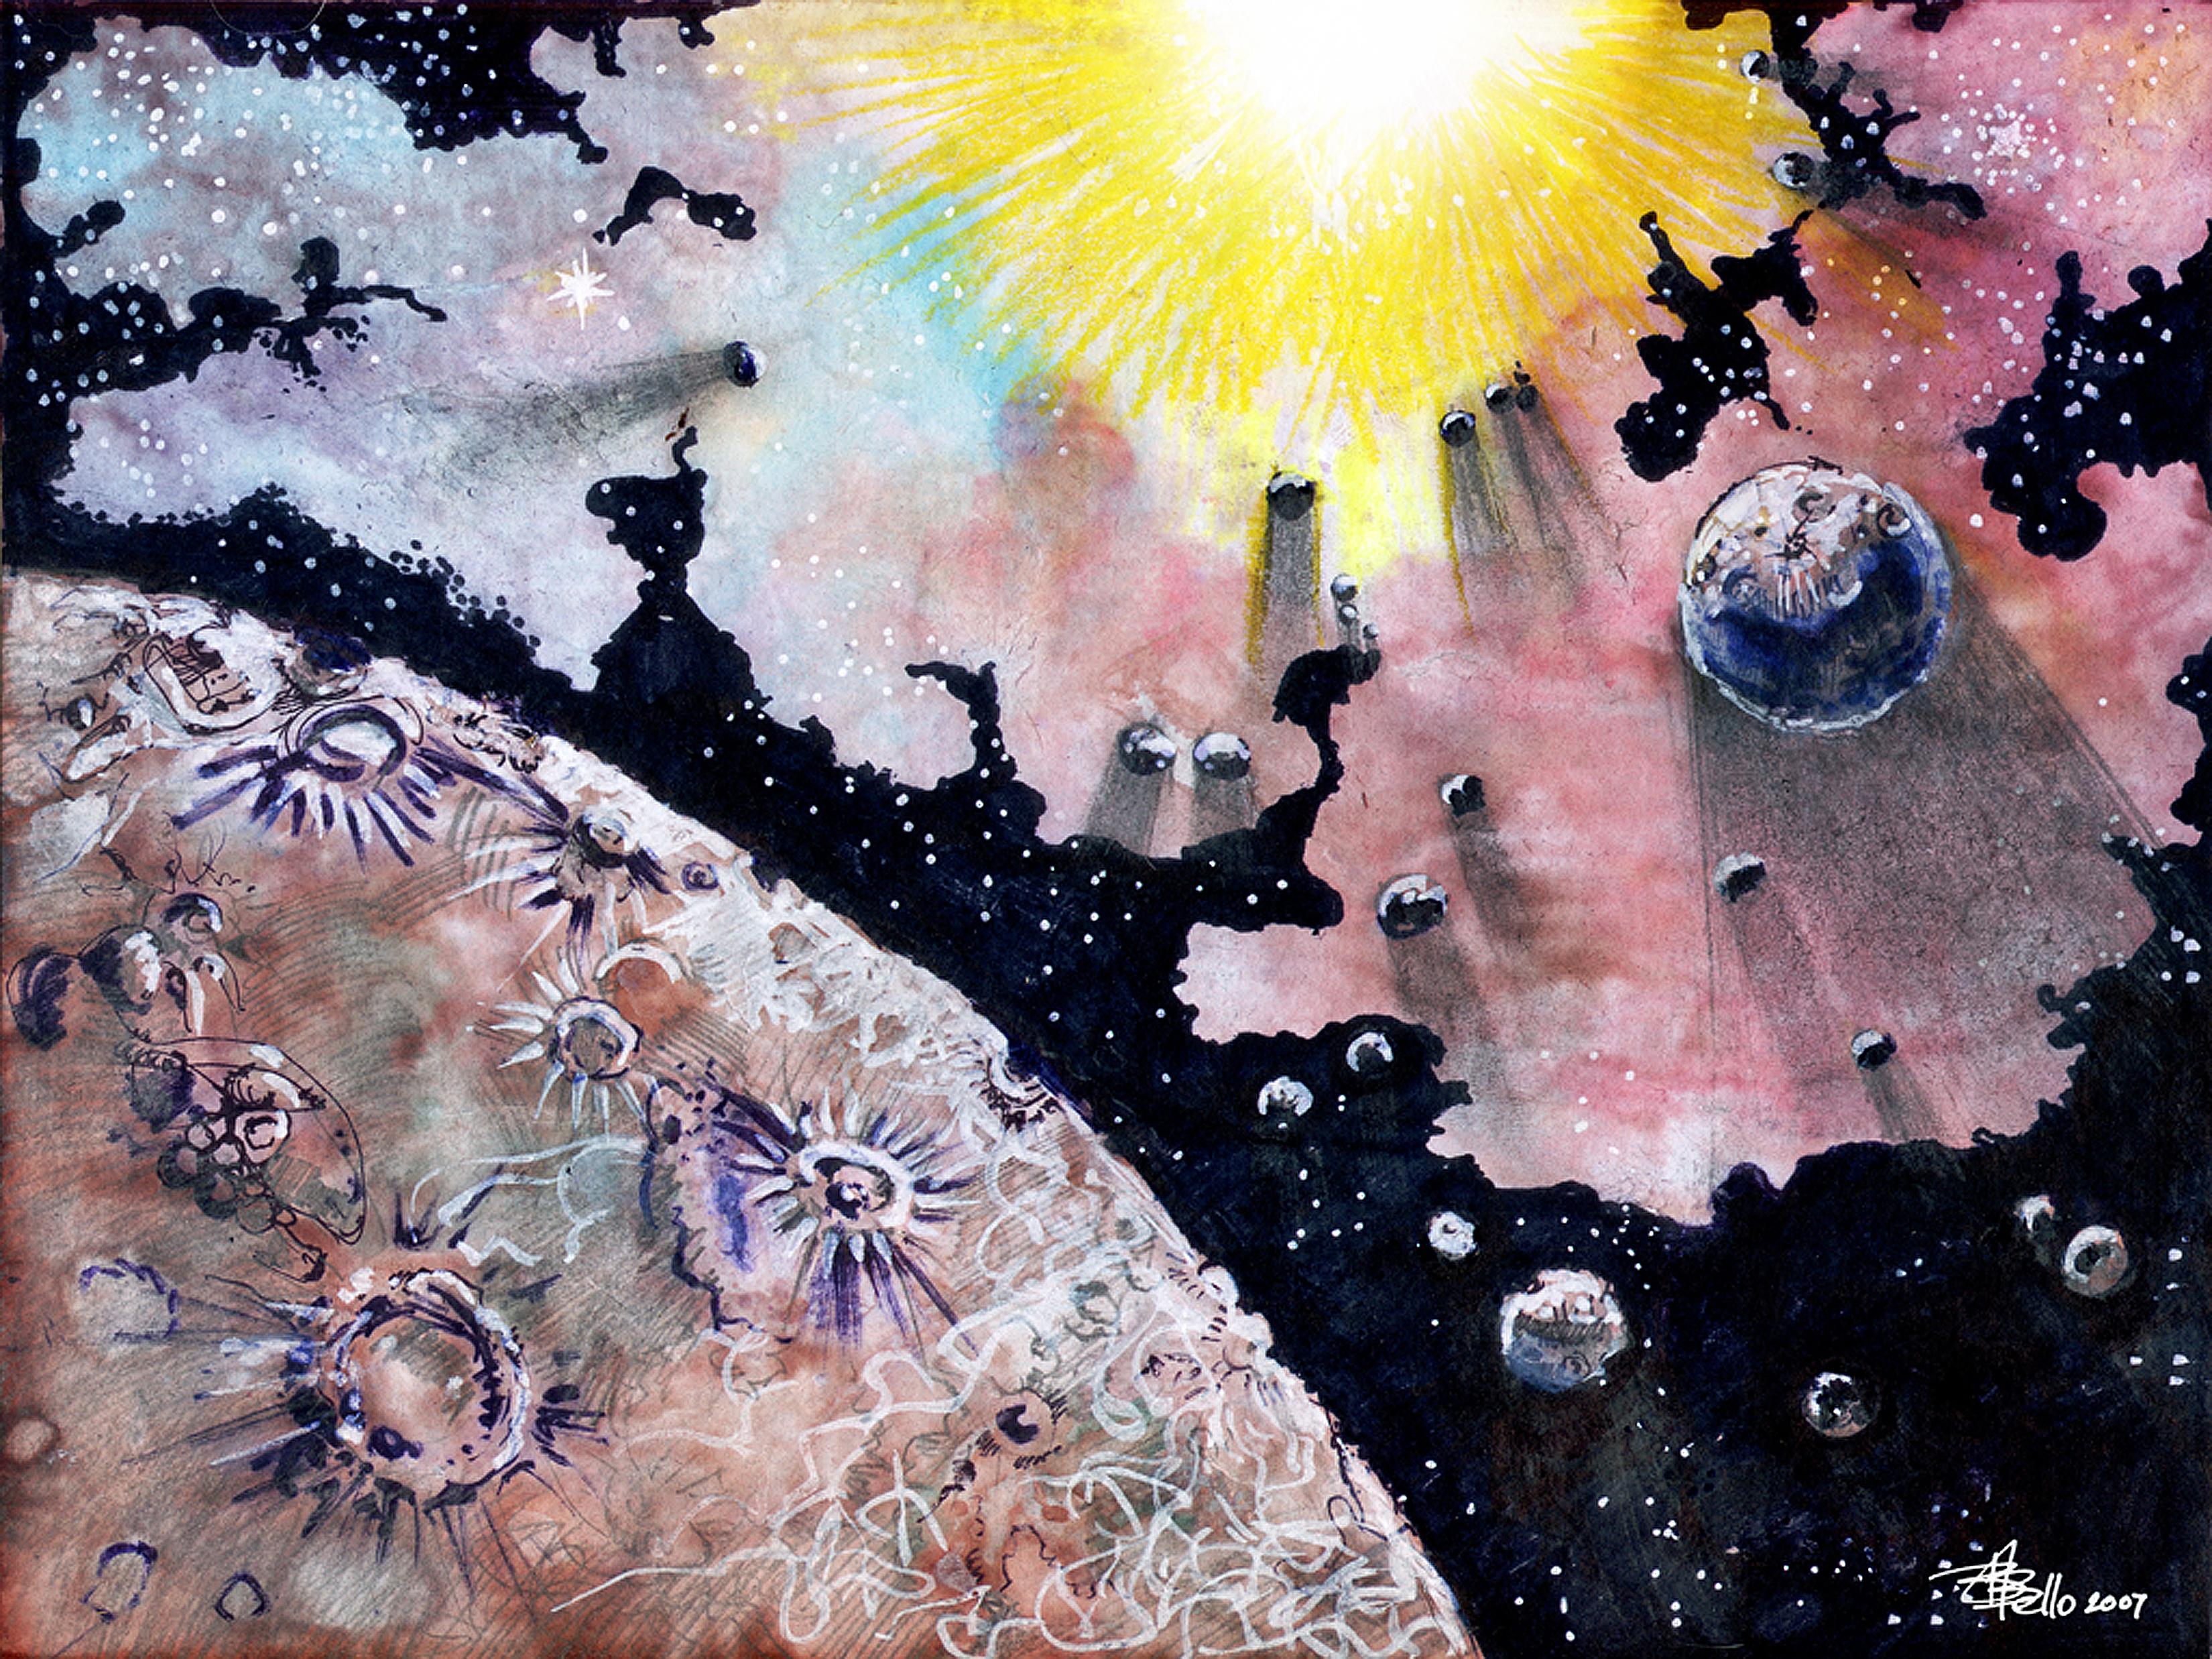 Gambar tinta pastel gambar sketsa karya seni ilustrasi pena digital stylus ruang kosmos planit kapal angkasa alam semesta lukisan cat air